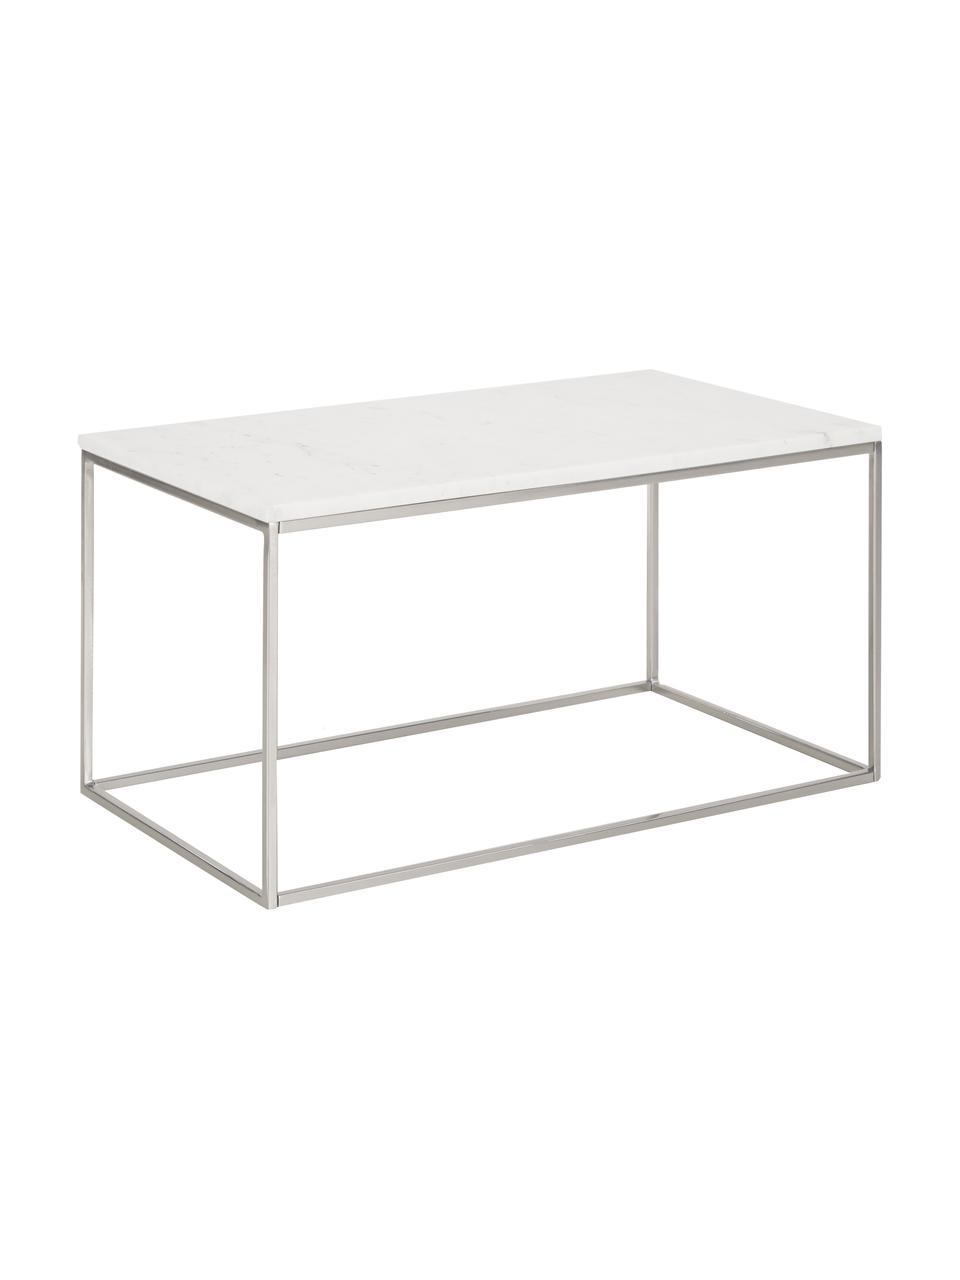 Marmeren salontafel Alys, Tafelblad: marmer, Frame: gepoedercoat metaal, Tafelblad: wit marmer. Frame: zilverkleurig, glanzend, 80 x 40 cm